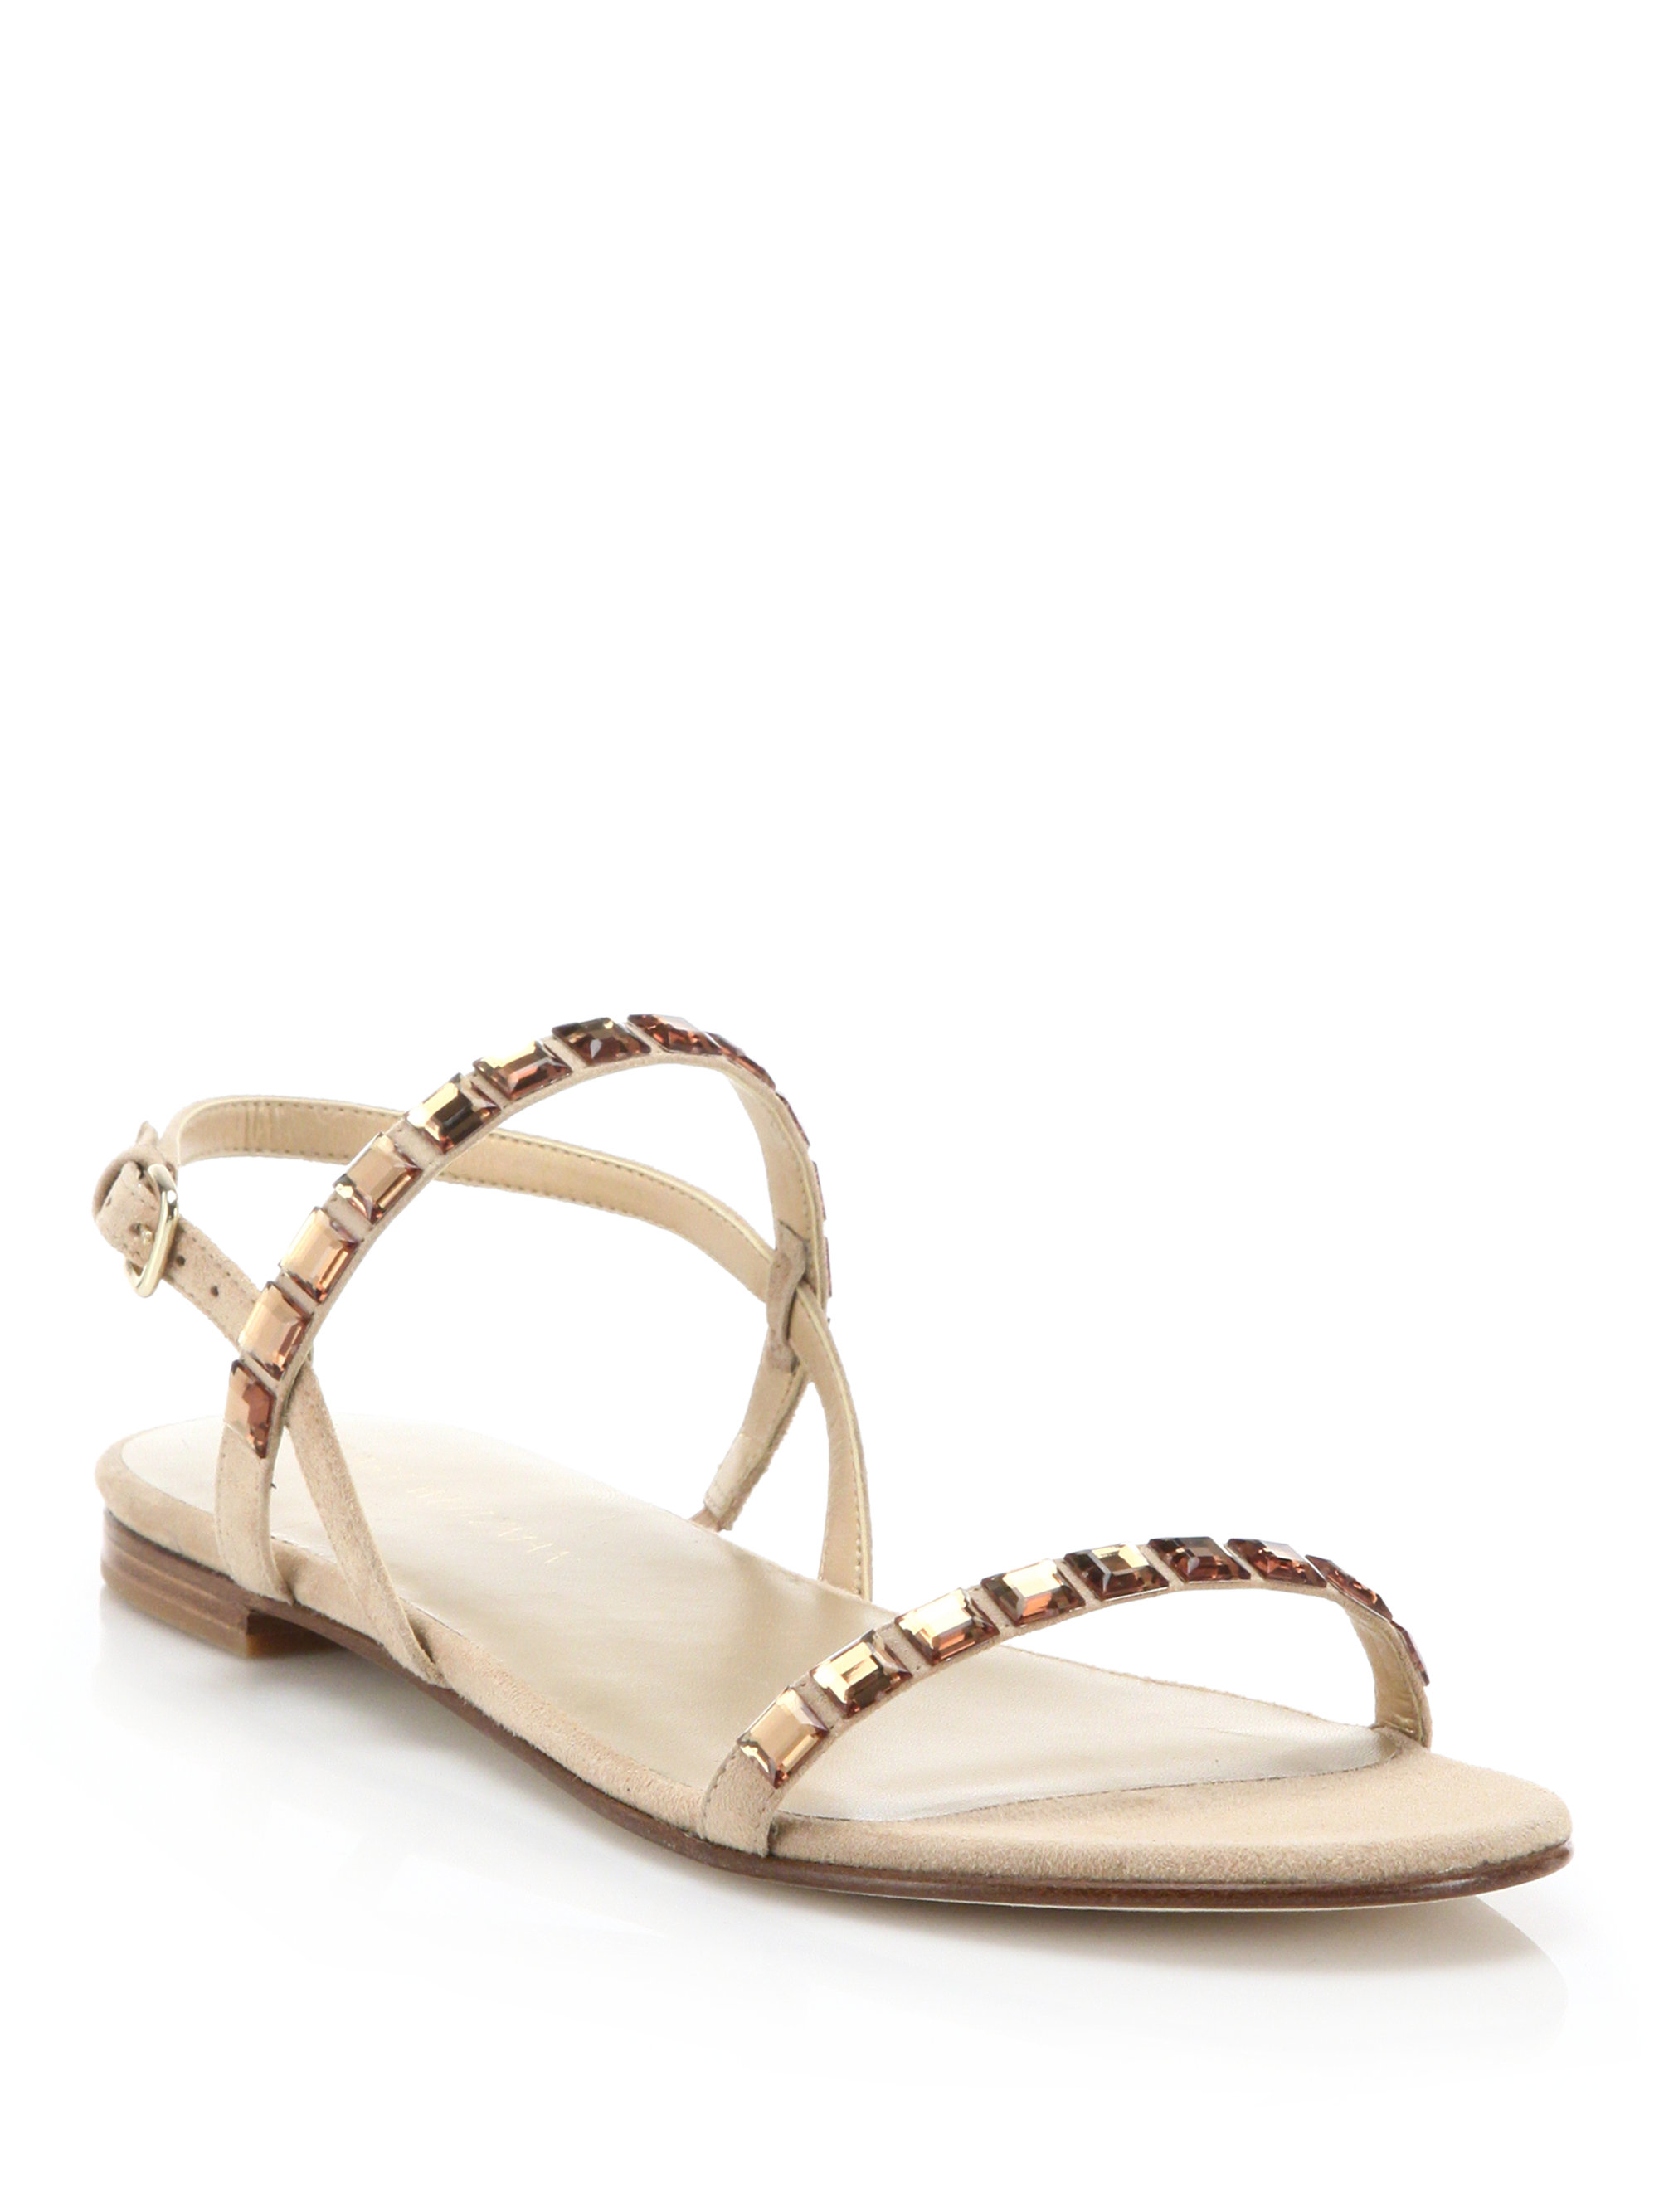 Lyst Stuart Weitzman Trailmix Jeweled Suede Flat Sandals